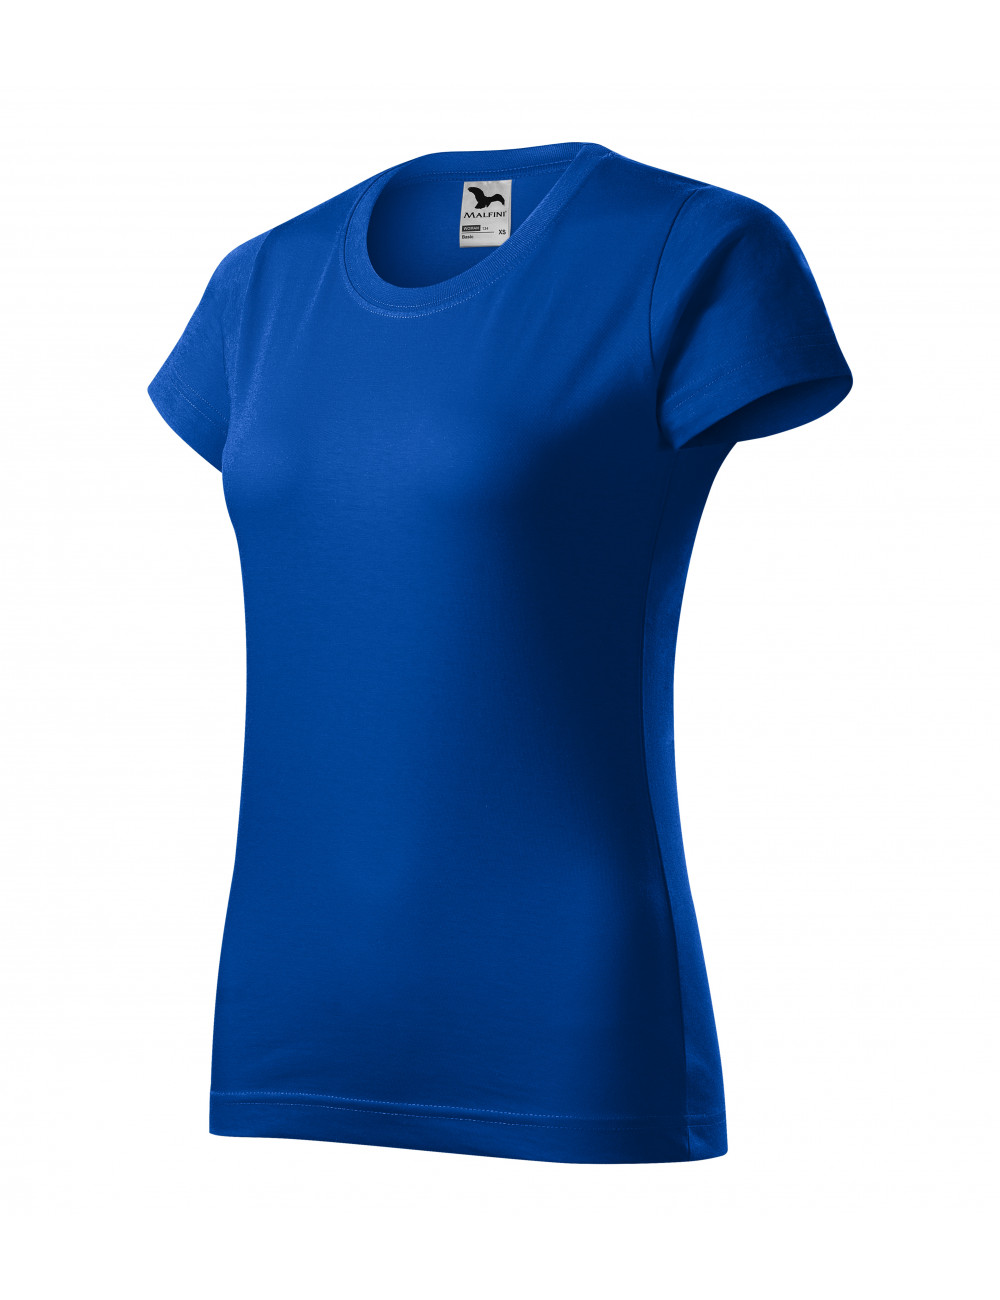 Adler MALFINI Koszulka damska Basic 134 chabrowy